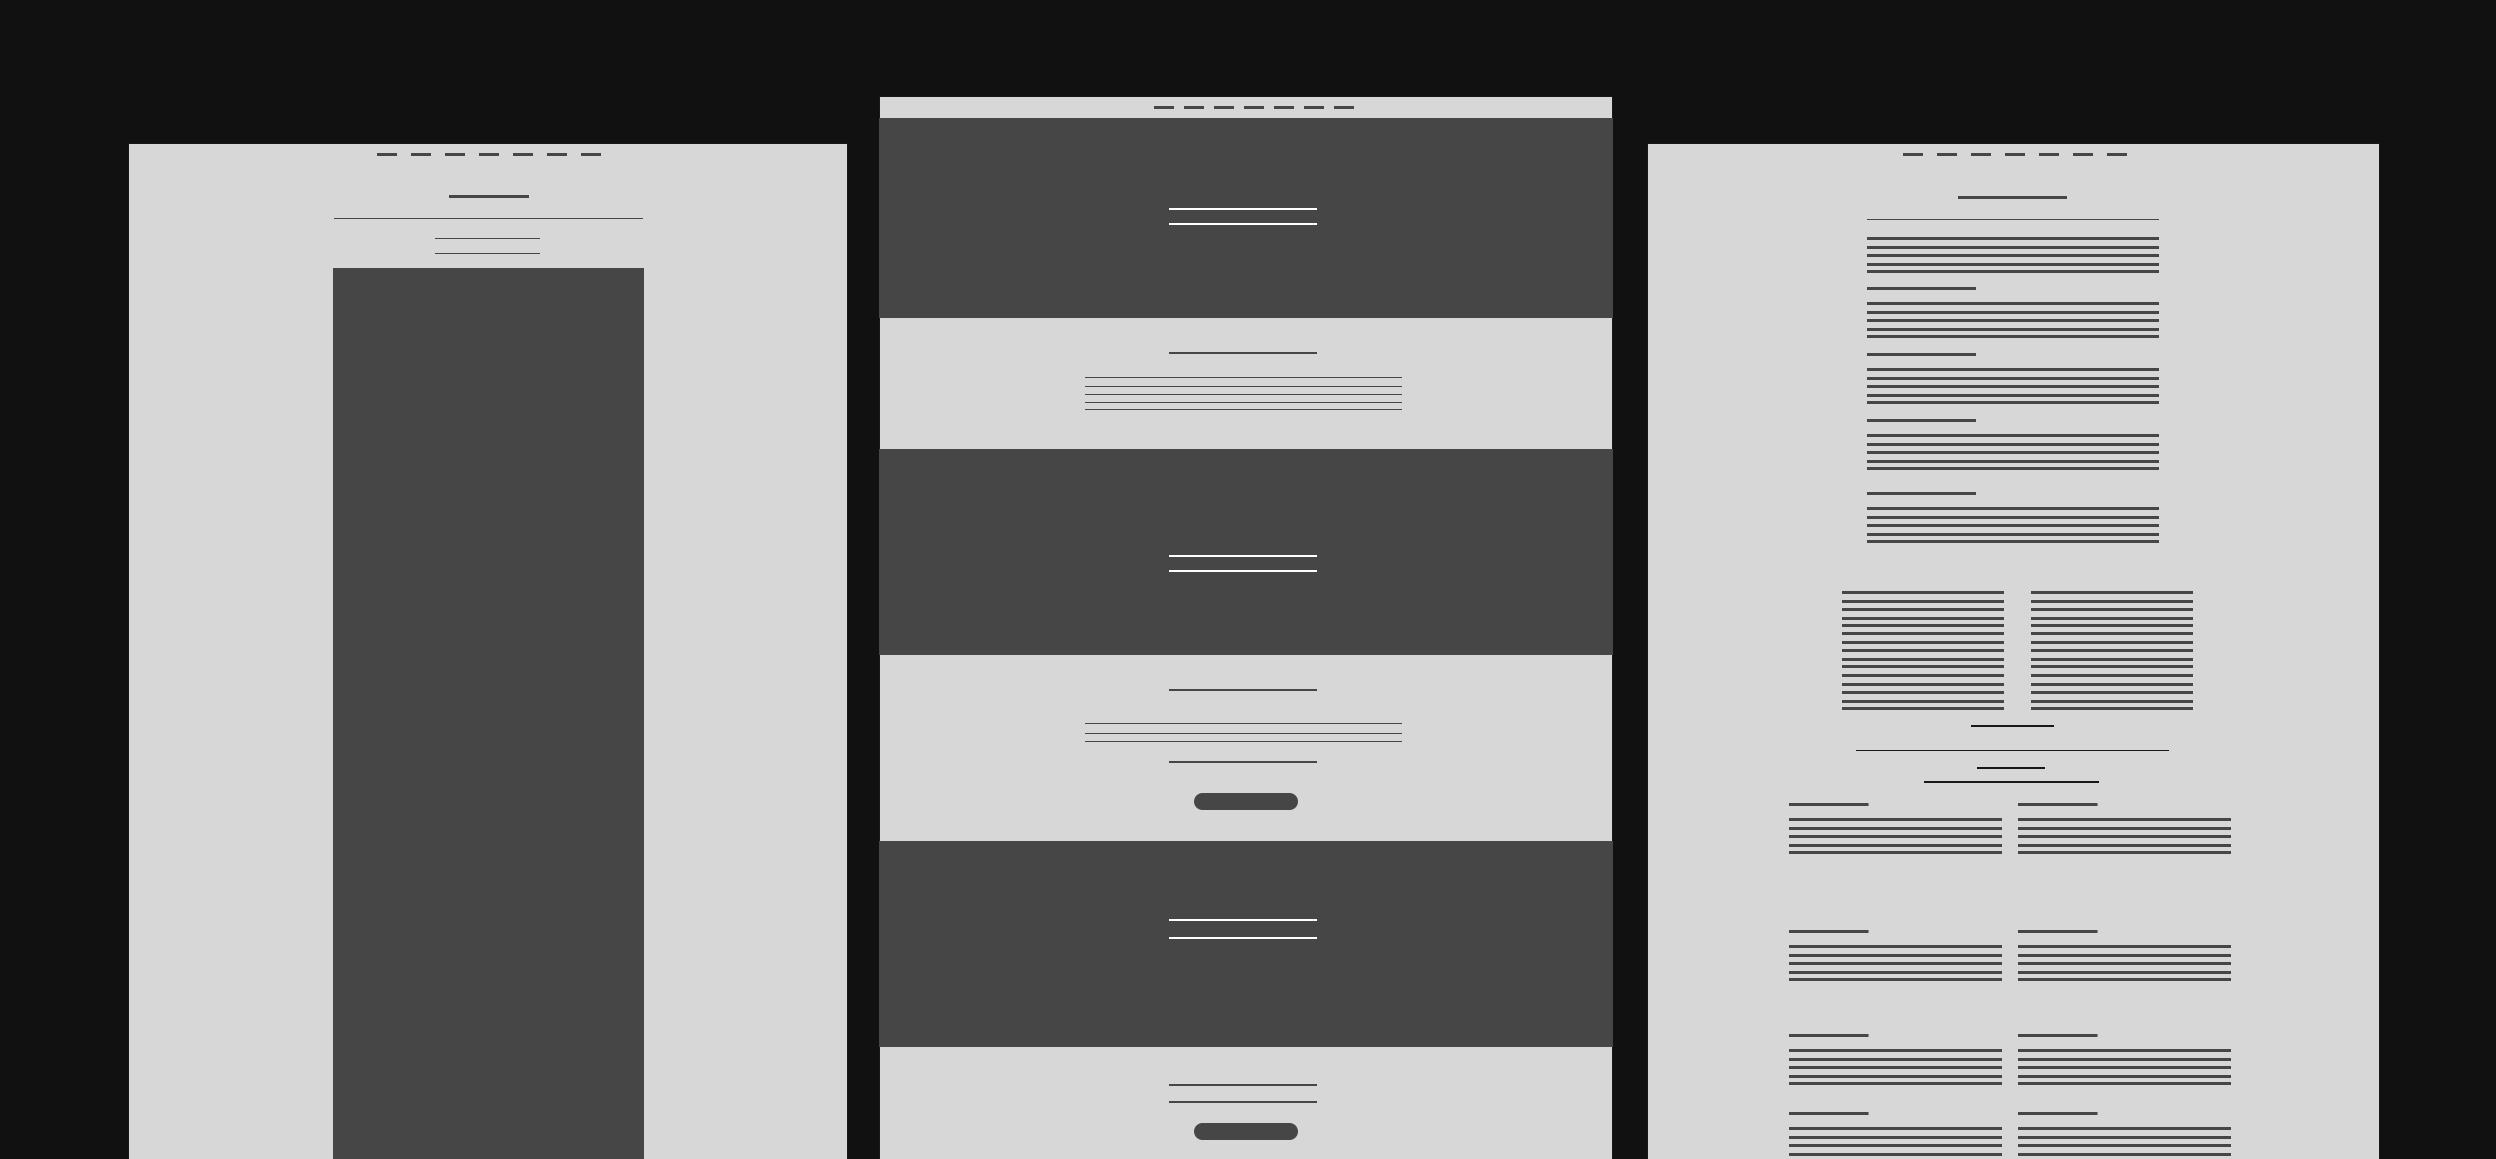 websites-lofiwireframe.jpg